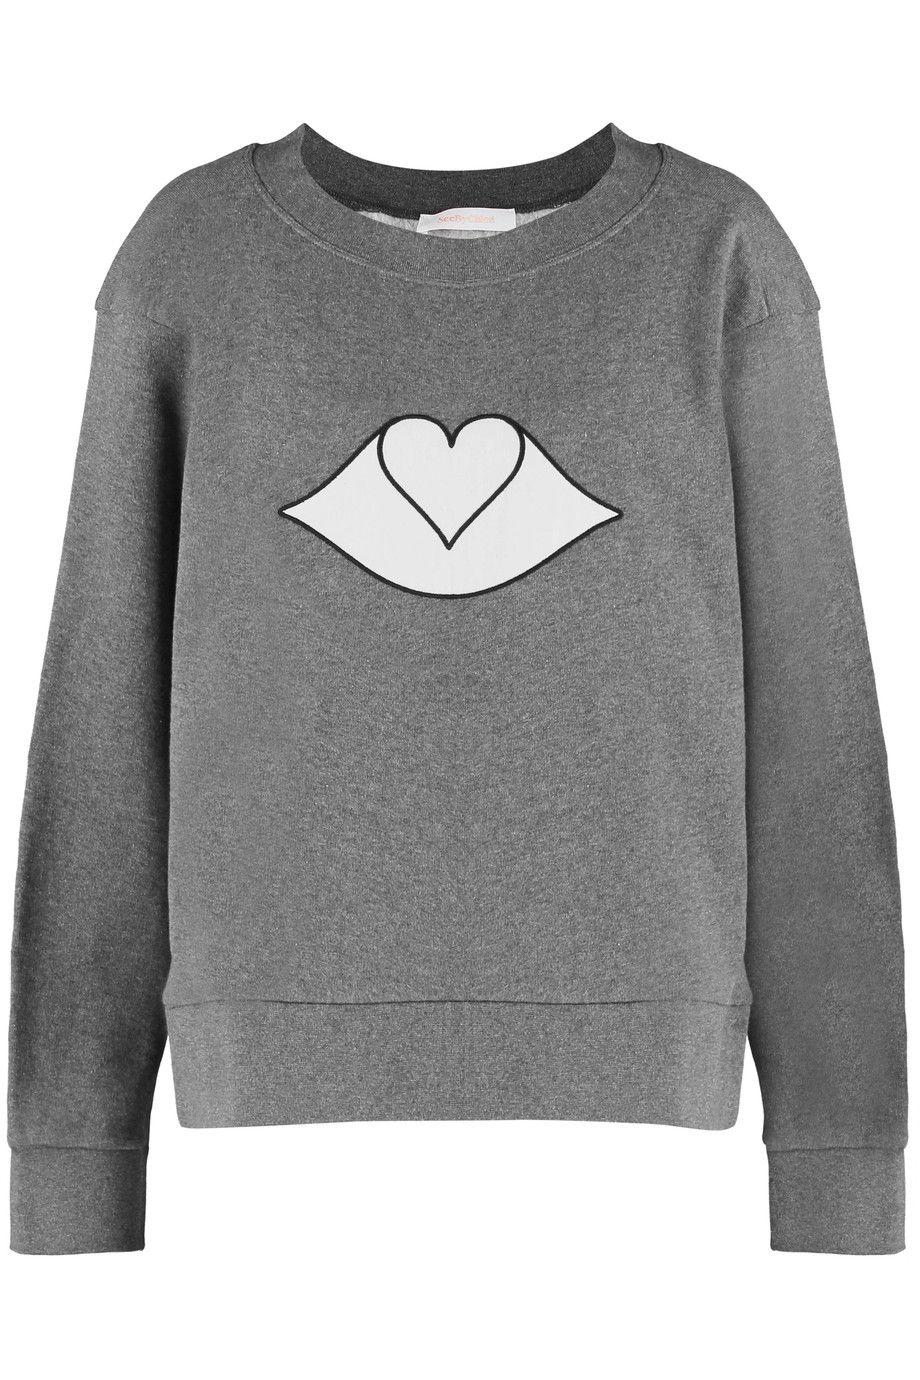 SEE BY CHLOÉ Appliquéd cotton-fleece sweatshirt. #seebychloé #cloth #sweatshirt